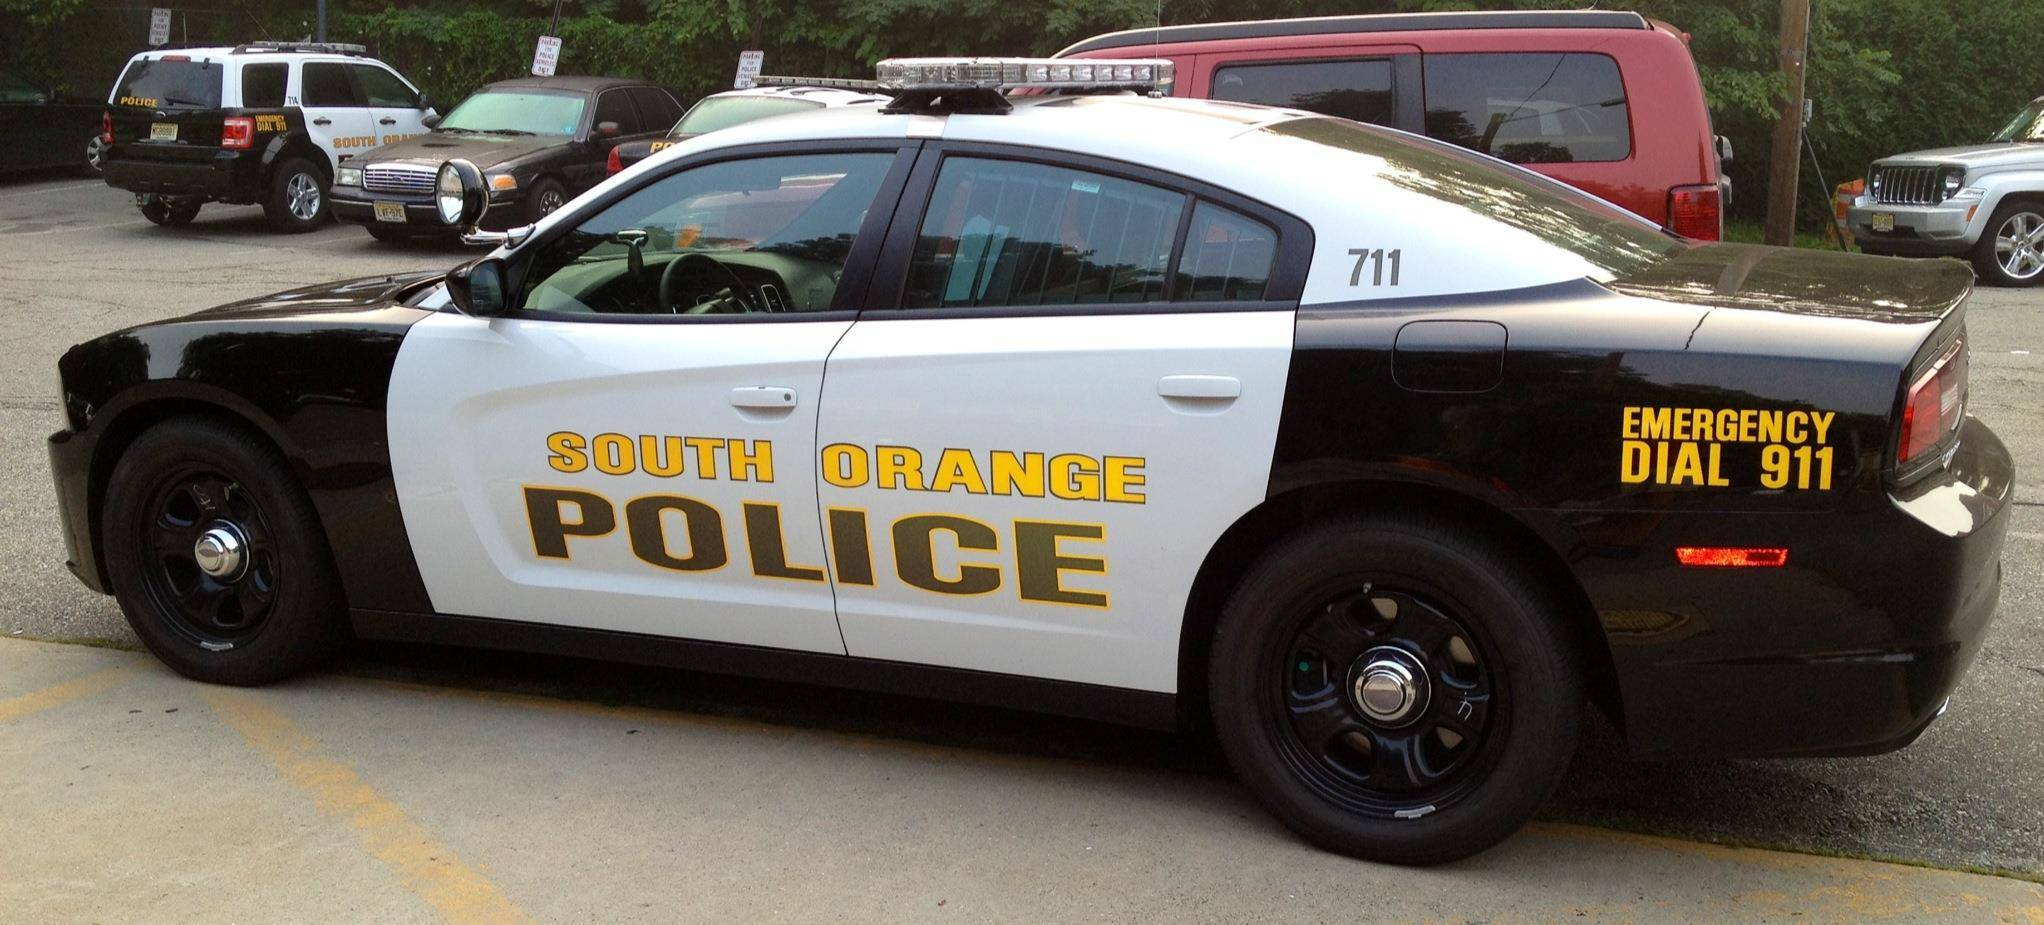 0a2372a0e24b902e43f7_south_orange_police.jpg